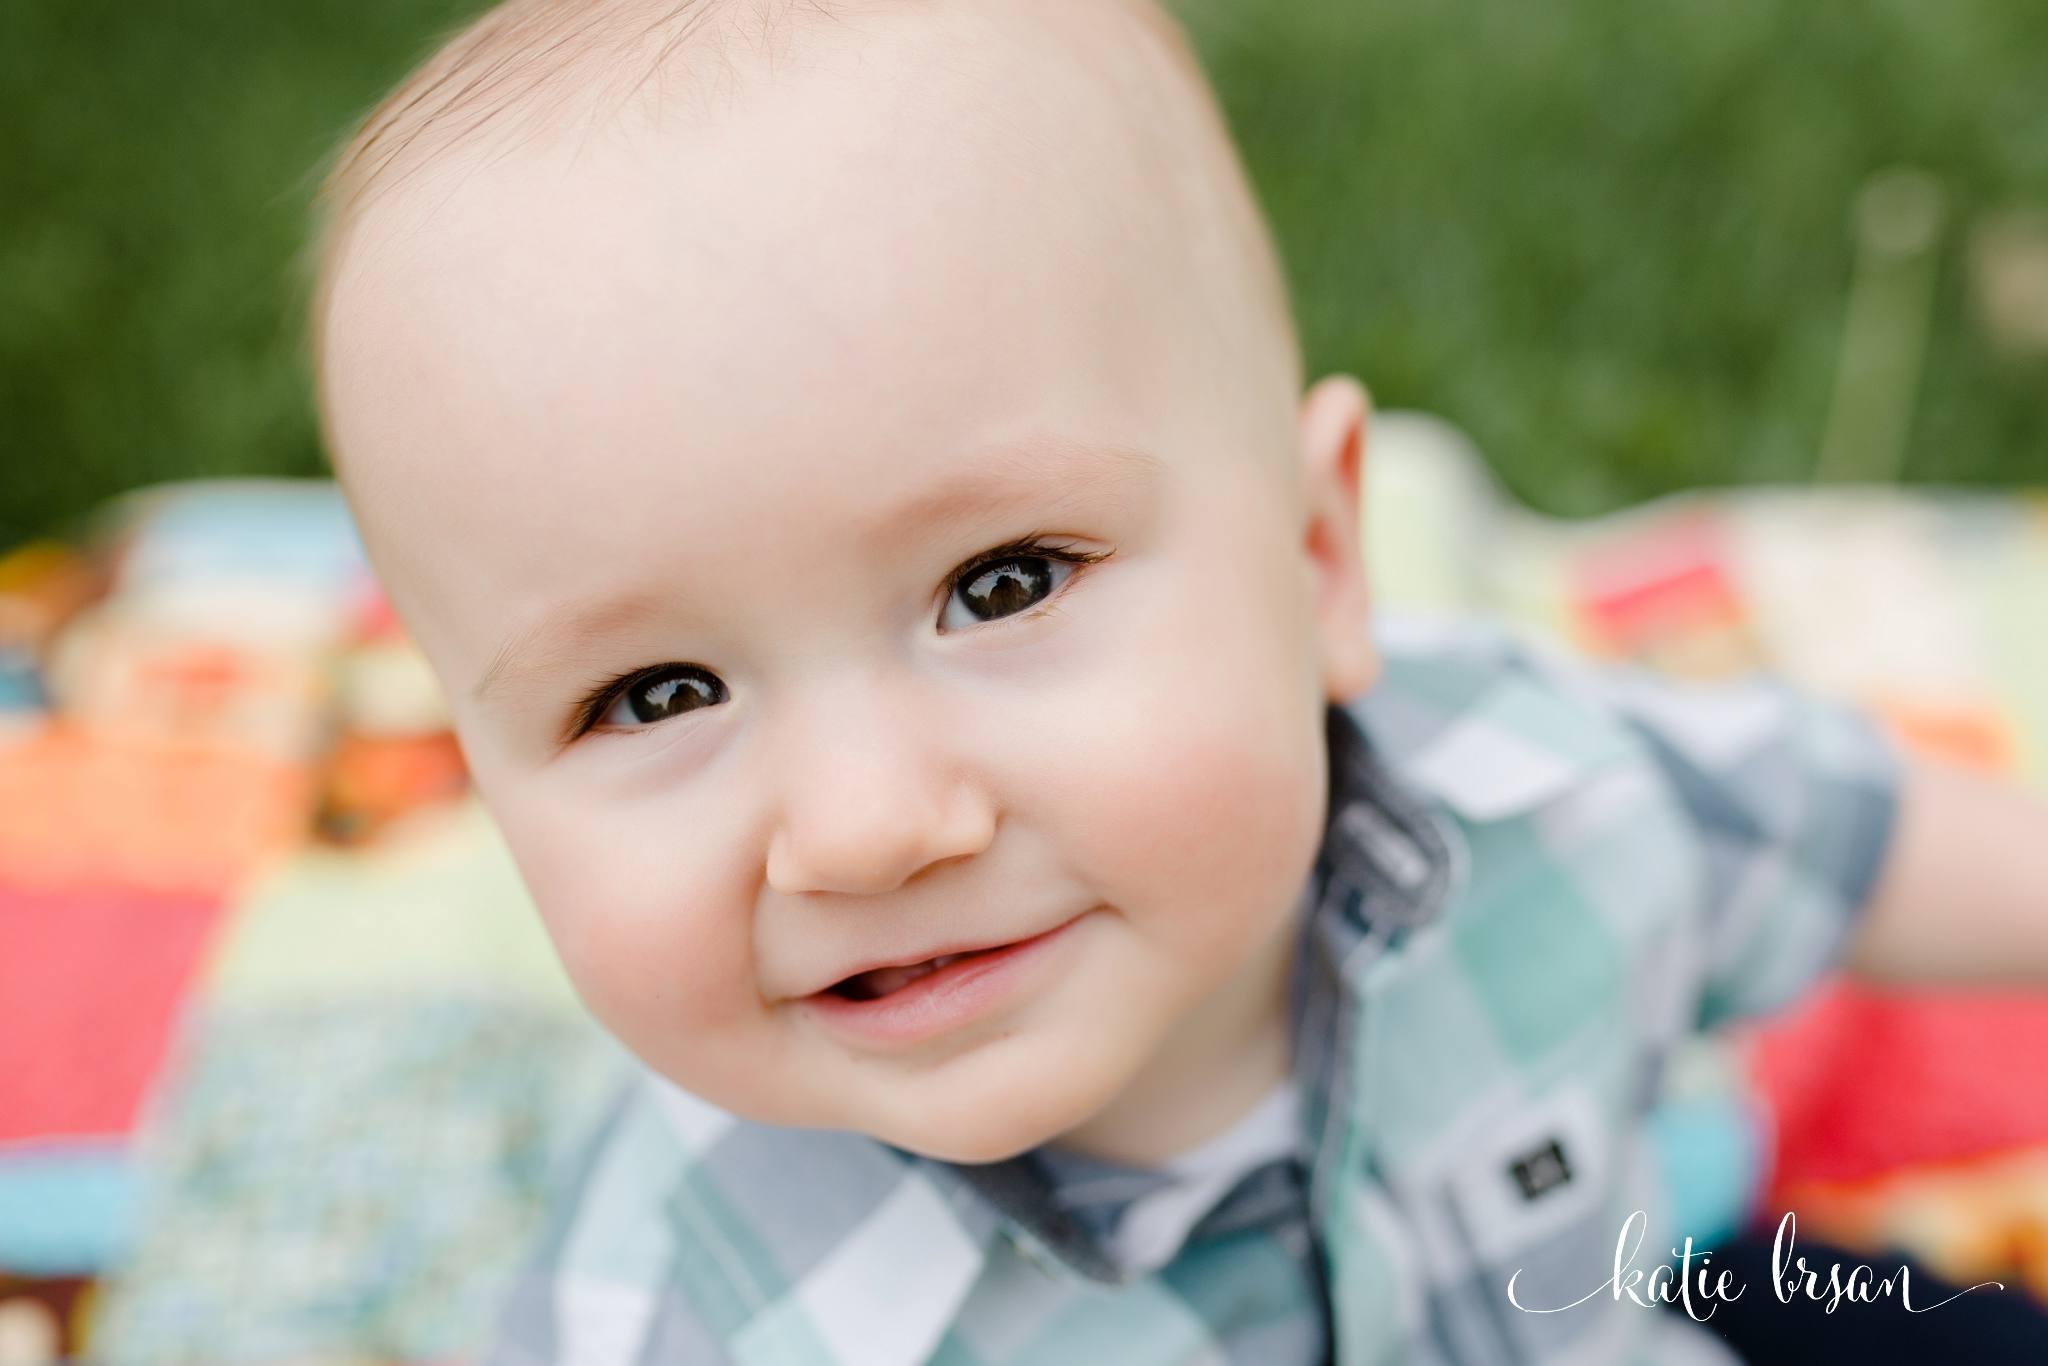 Mokena_FamilyPhotographer_9month_milestone_session_1459.jpg